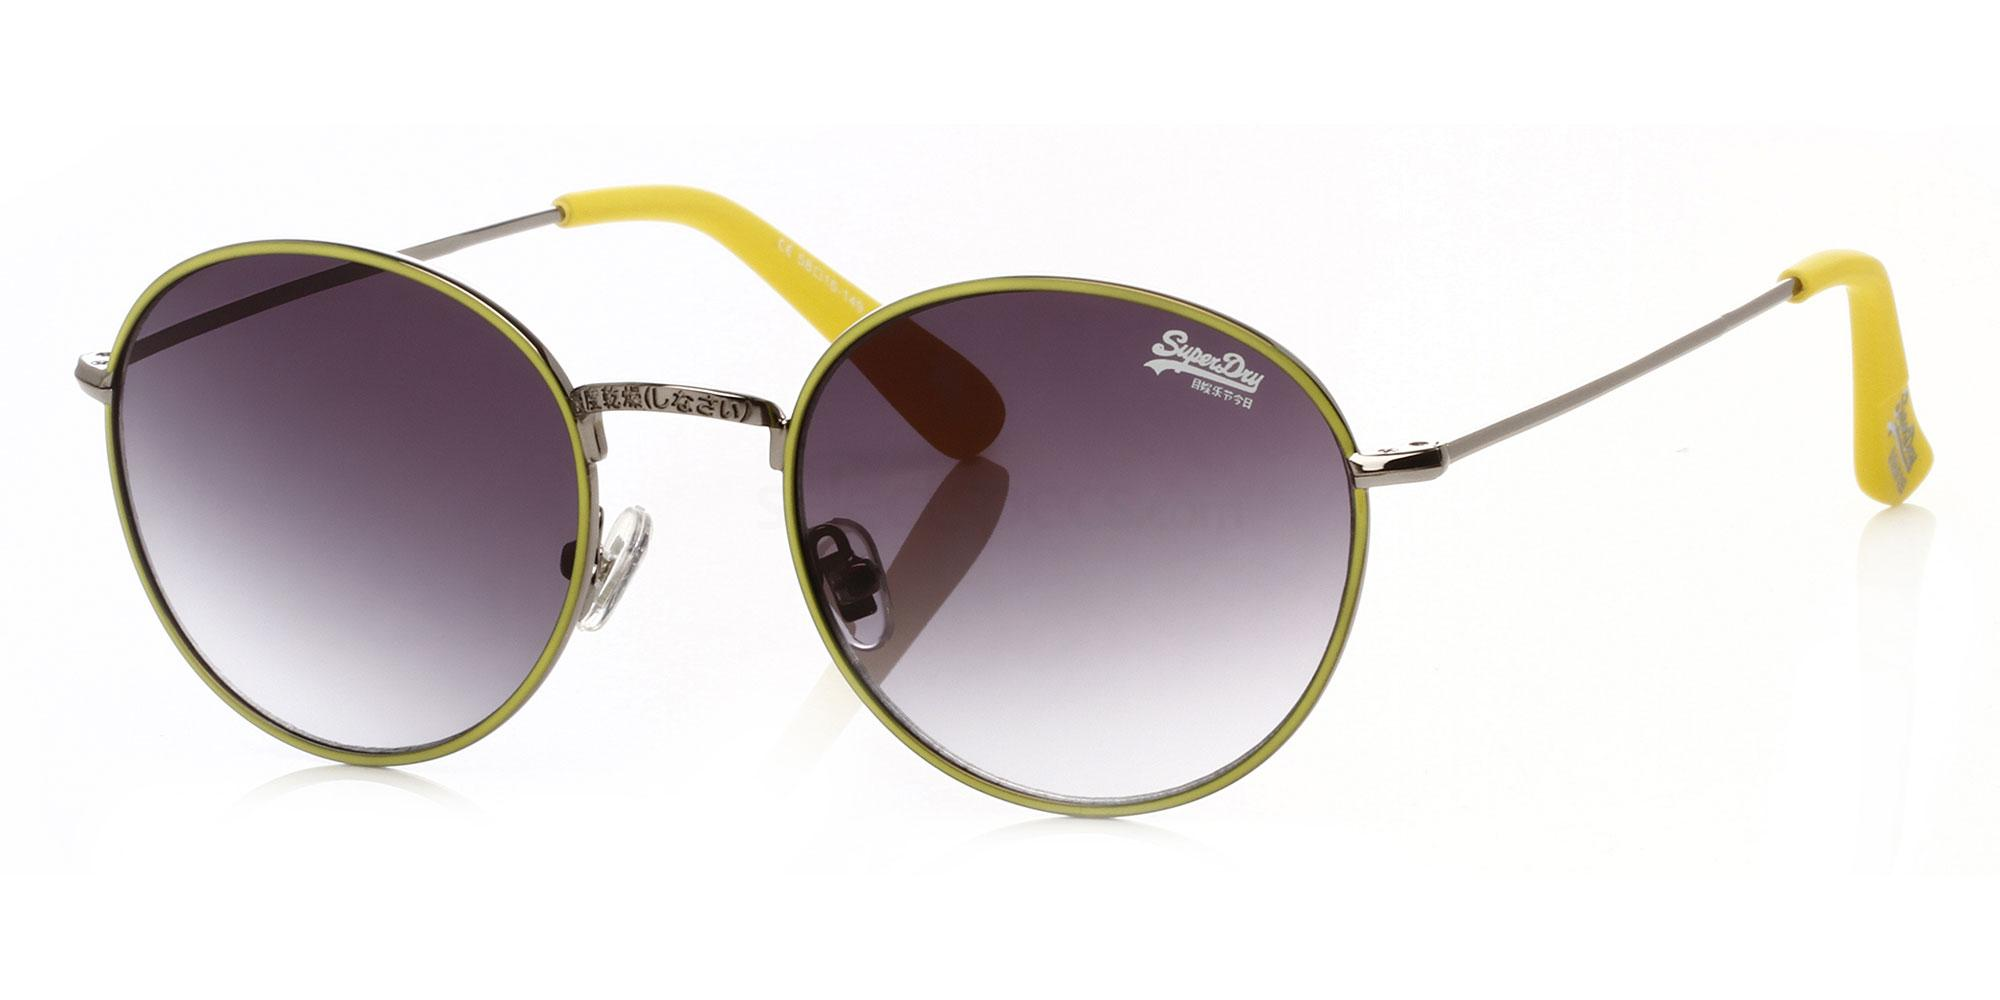 Superdray violet sunglasses